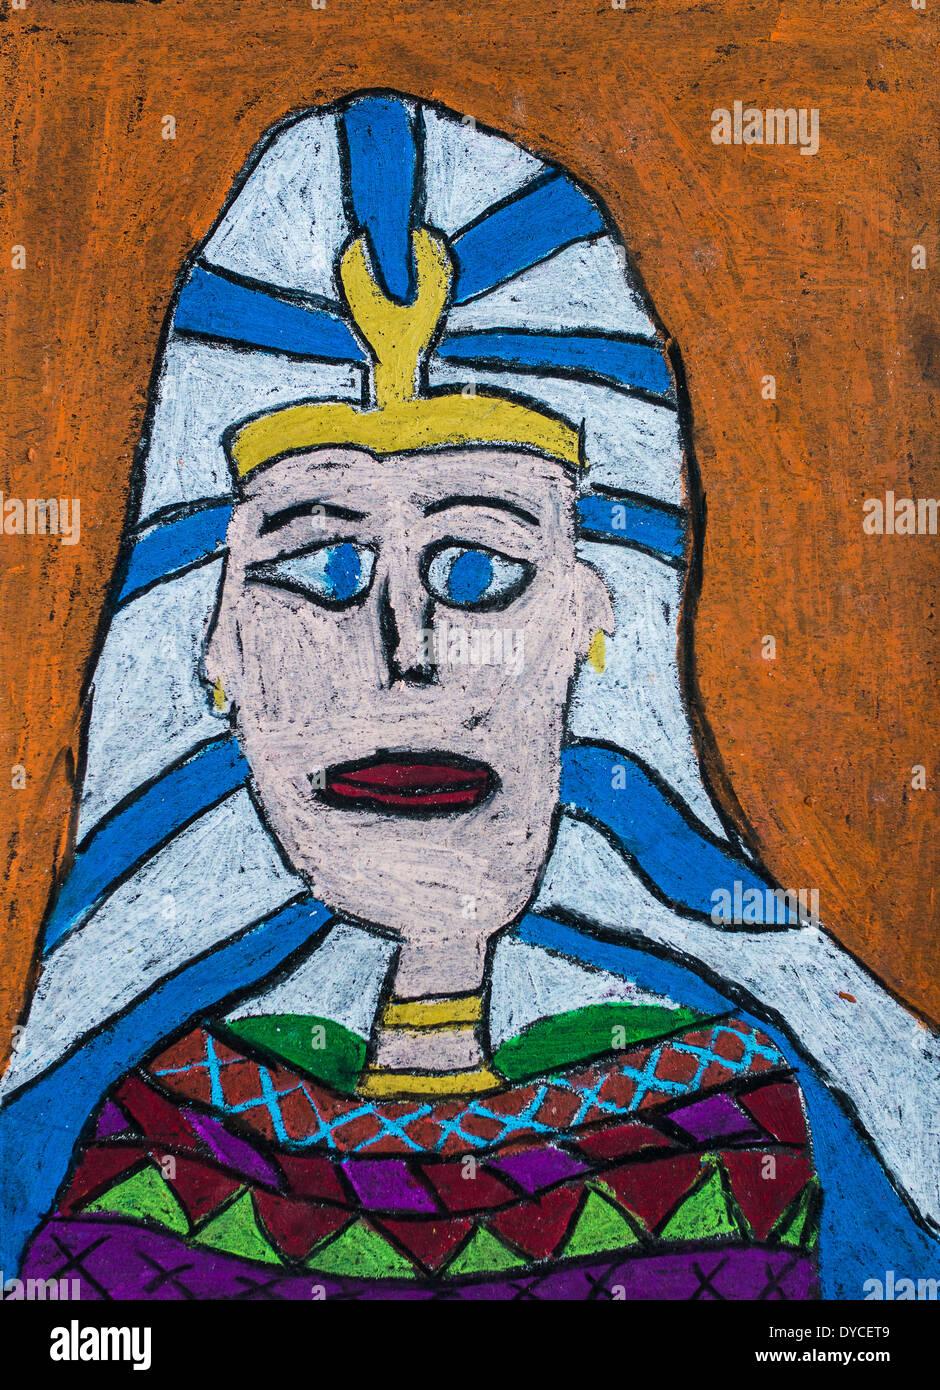 Child's art project: Pharaohs. Stock Photo